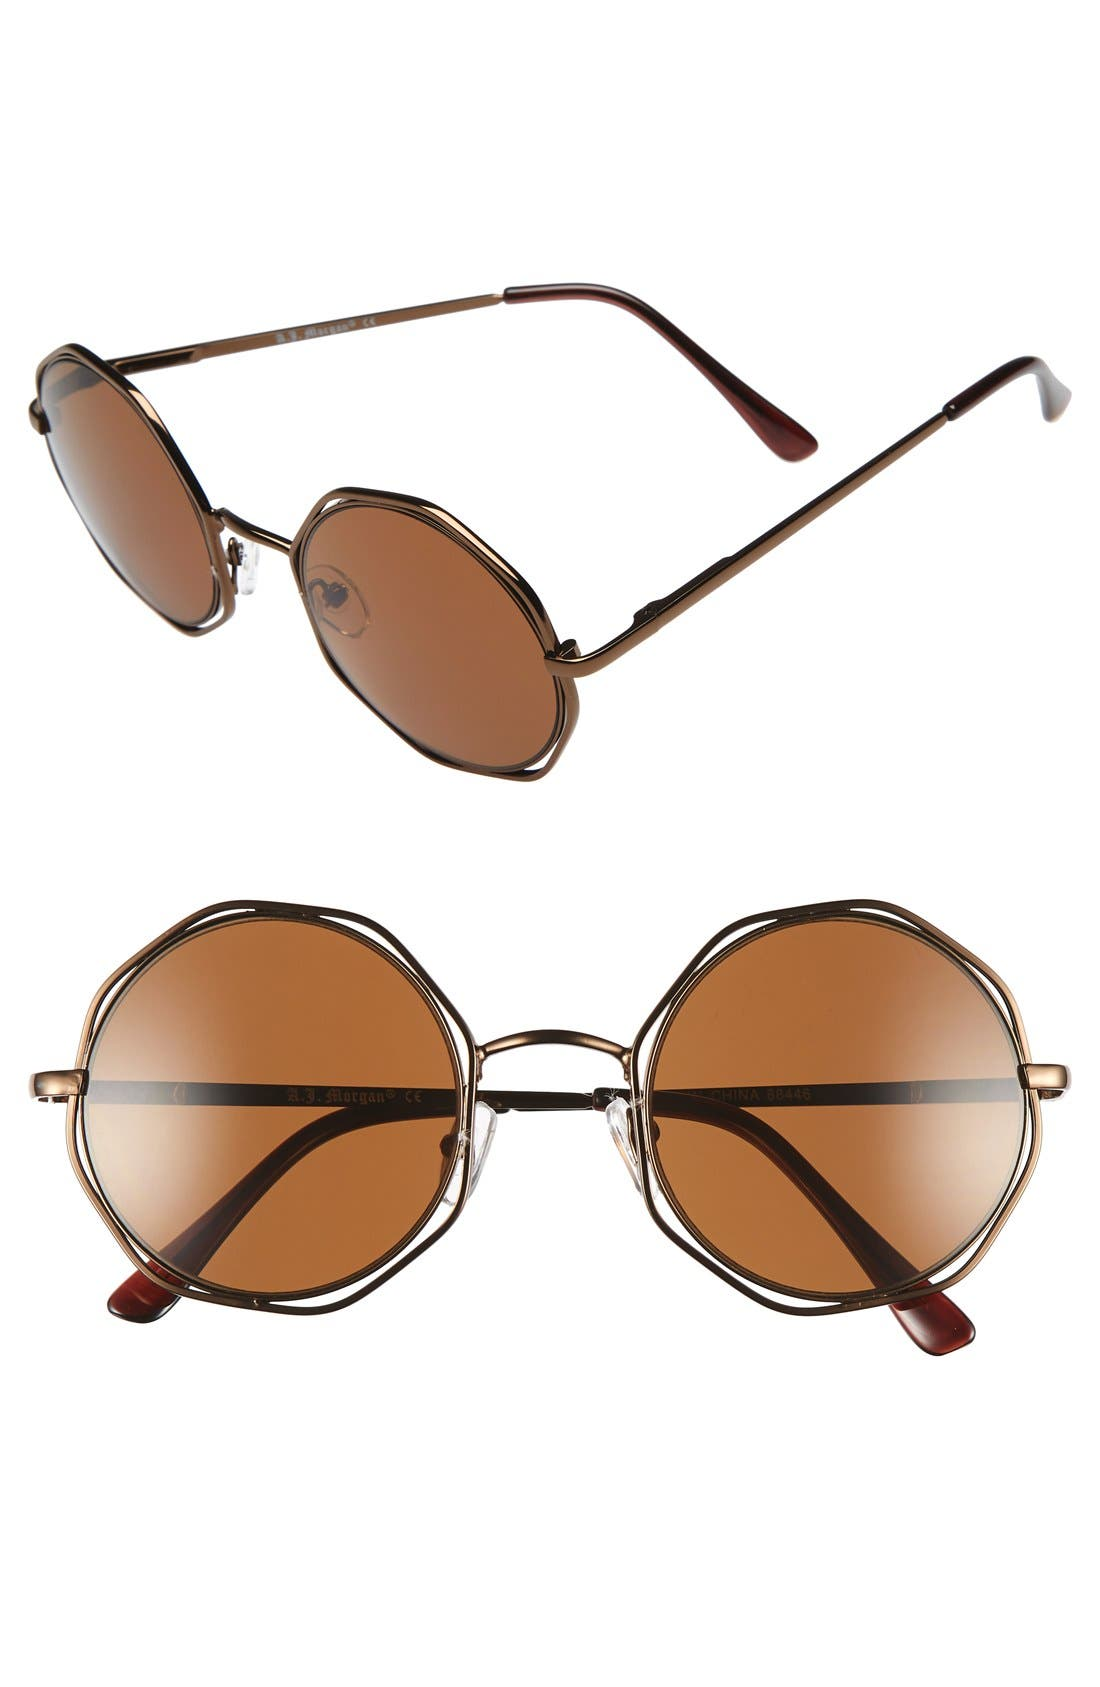 Main Image - A.J. Morgan 'Clayton' 48mm Octagon Wire Sunglasses